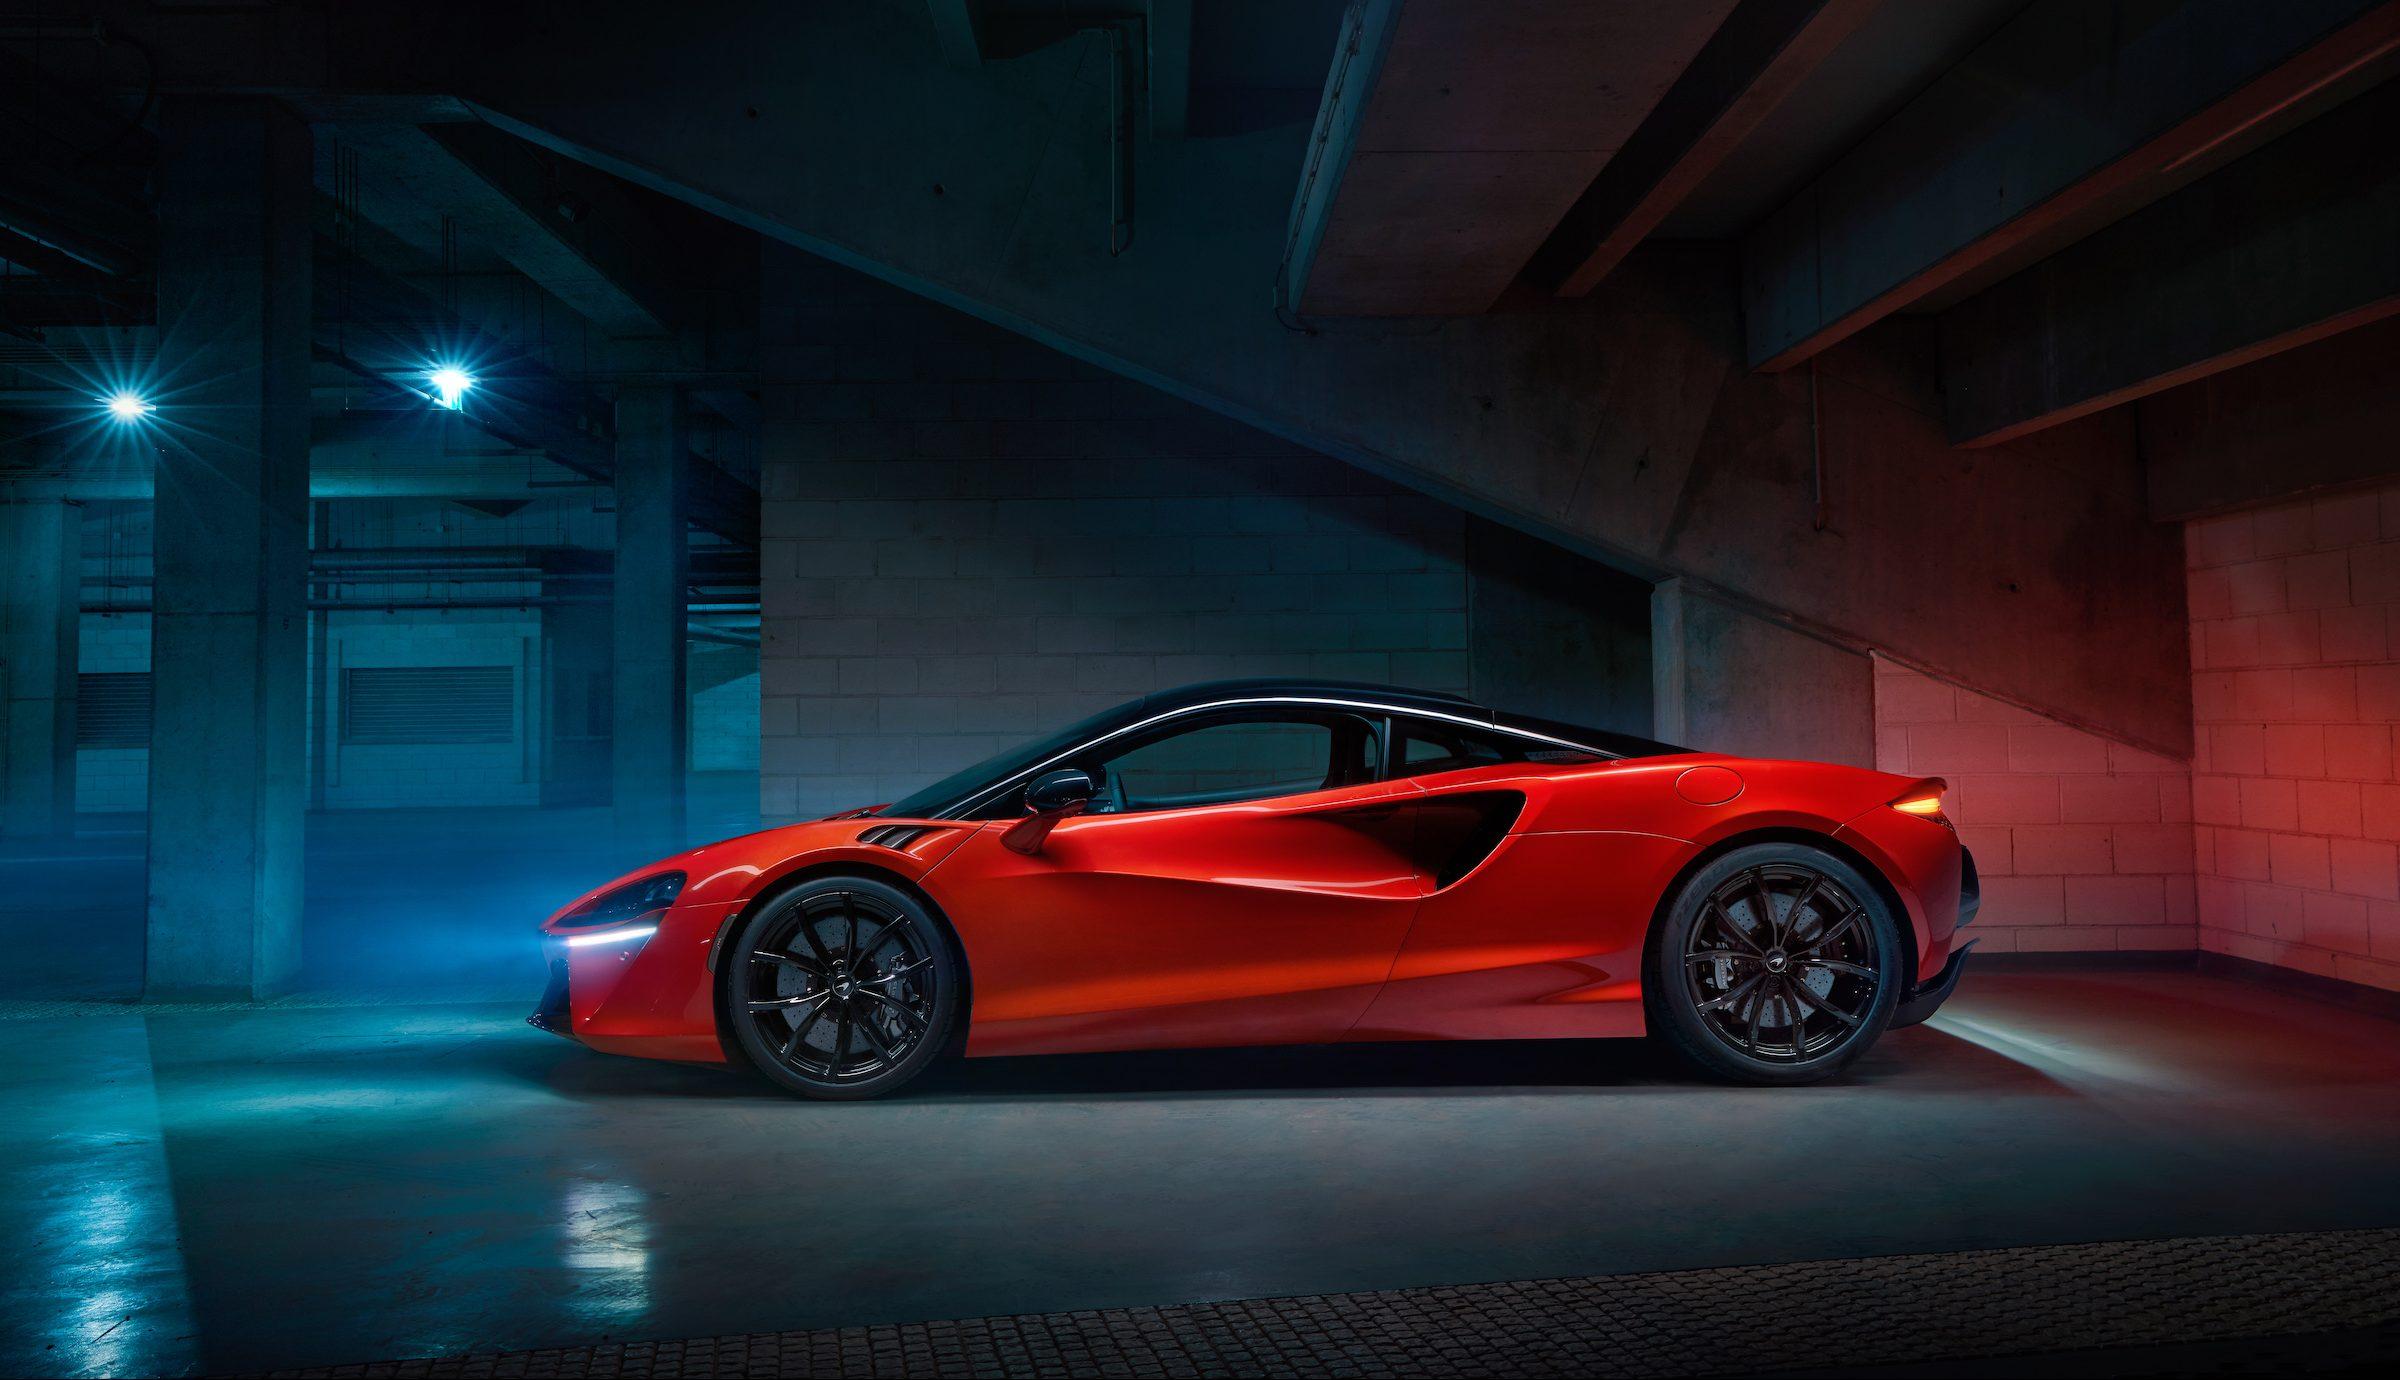 McLaren Artura: Hybrid 670bhp supercar debuts